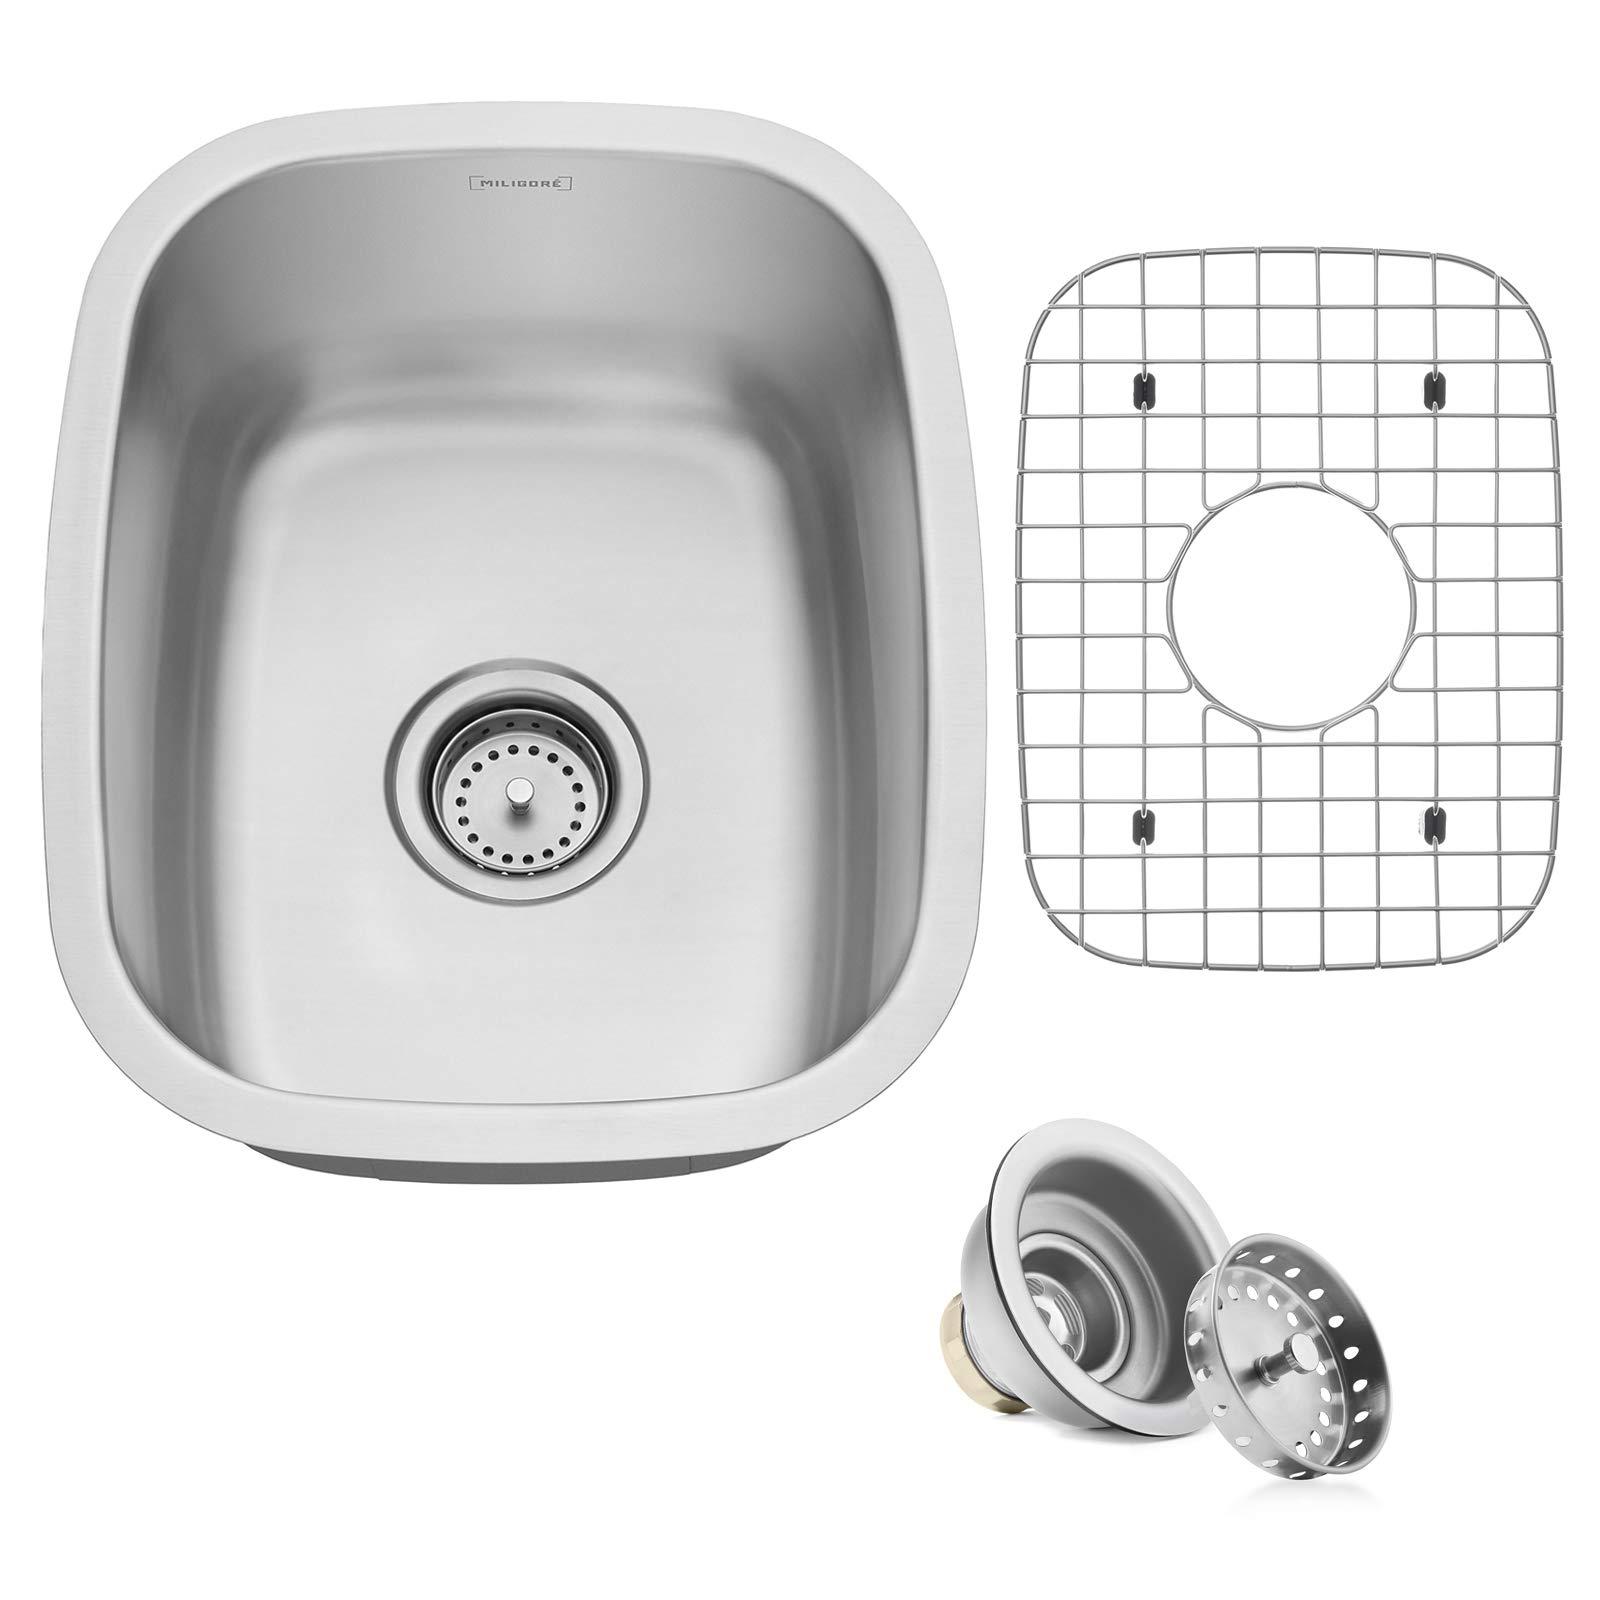 Miligore 15'' x 18'' x 8'' Deep Single Bowl Undermount 16-Gauge Stainless Steel Kitchen/Bar/Prep Sink - Includes Drain/Grid